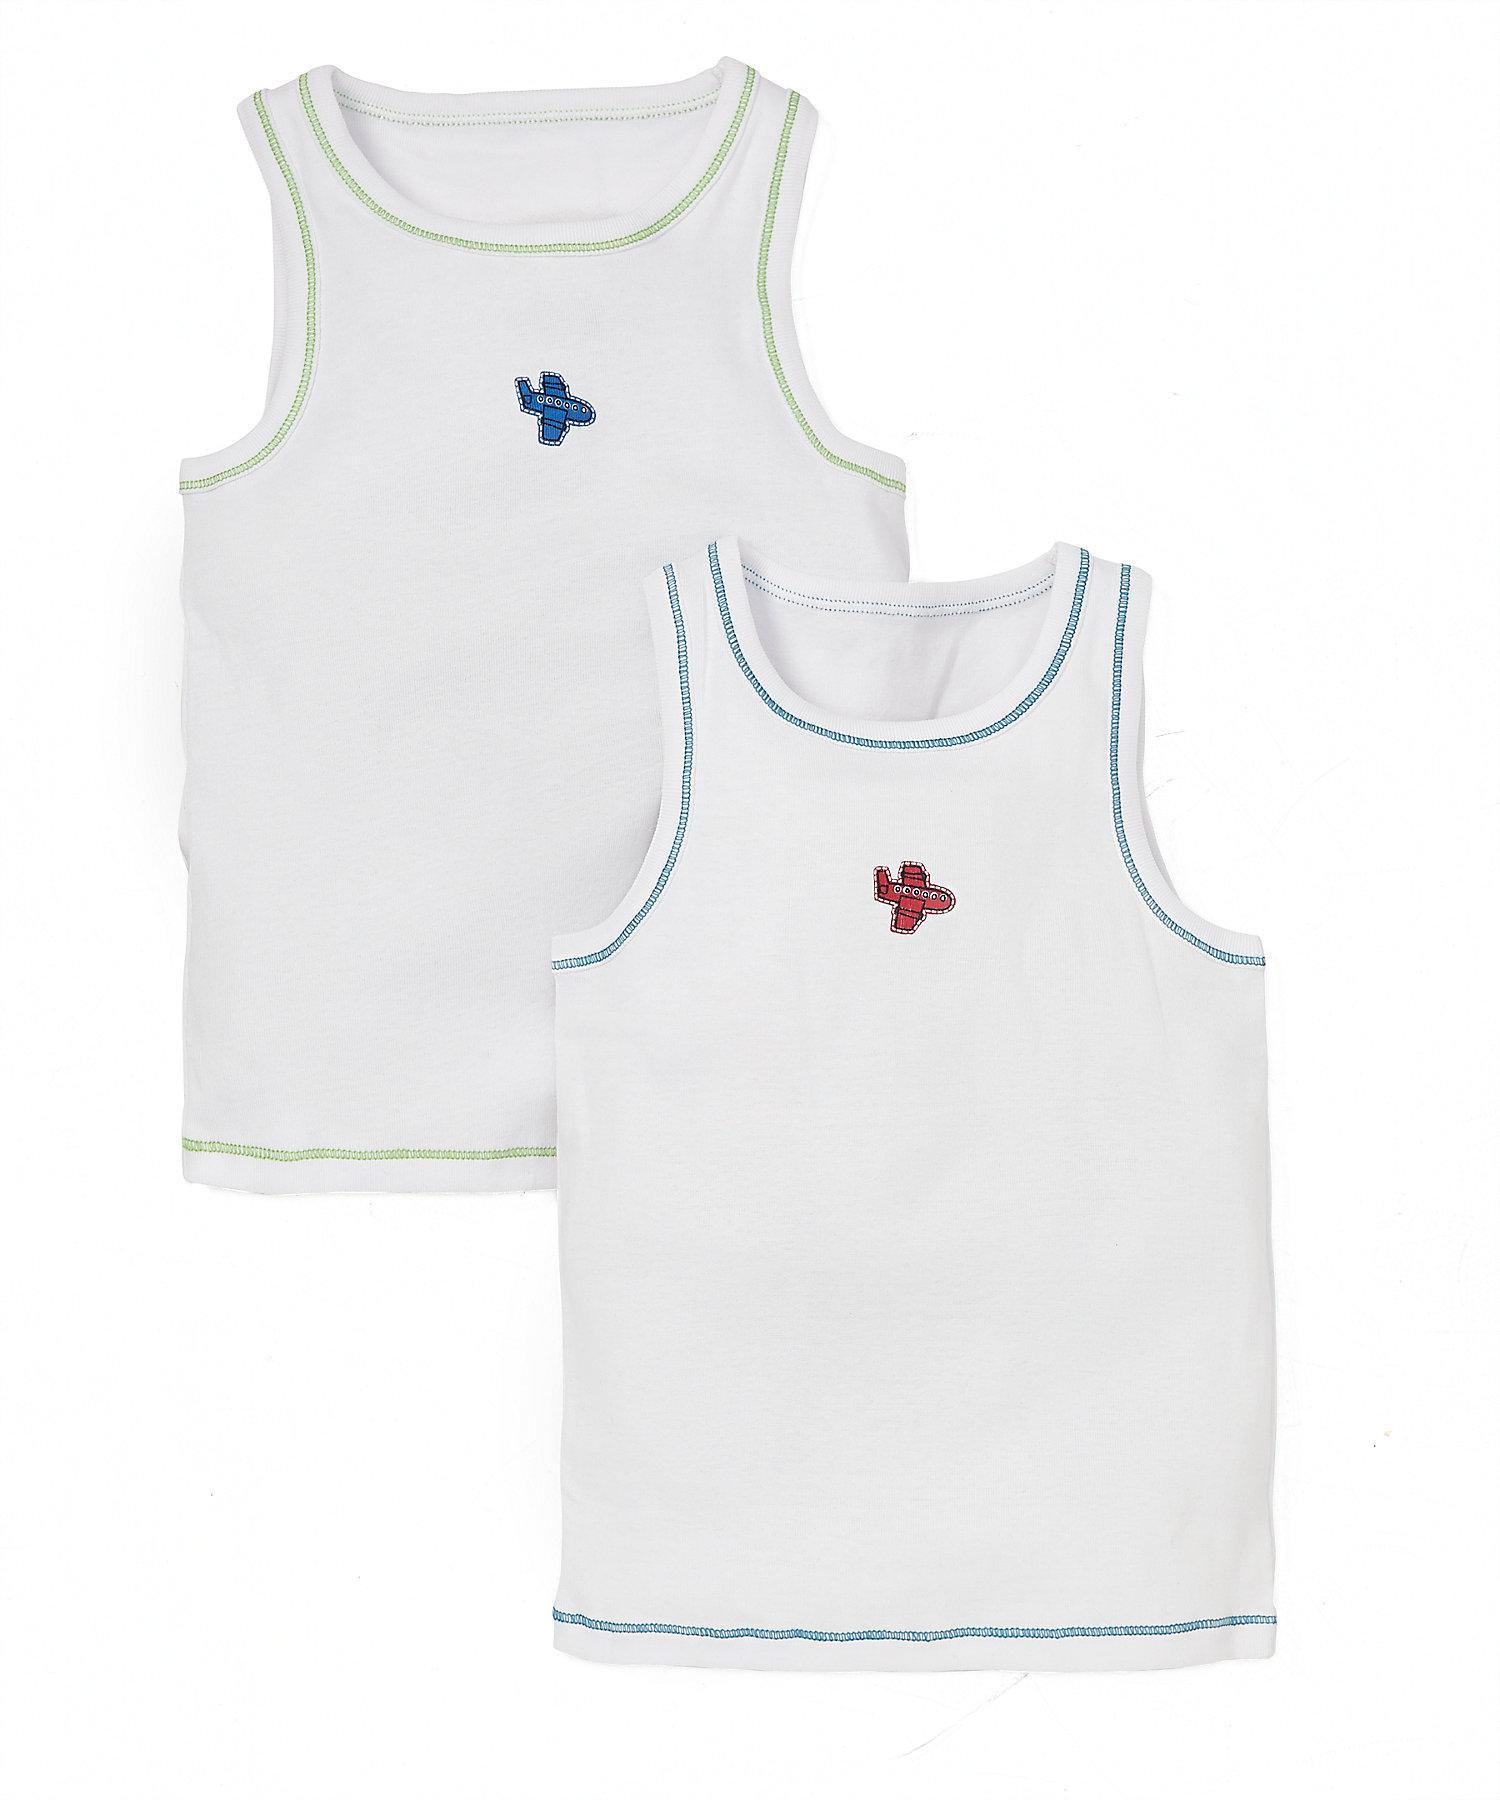 Mothercare   Boys Sleeveless Vest Aeroplane Print - Pack Of 2 - White